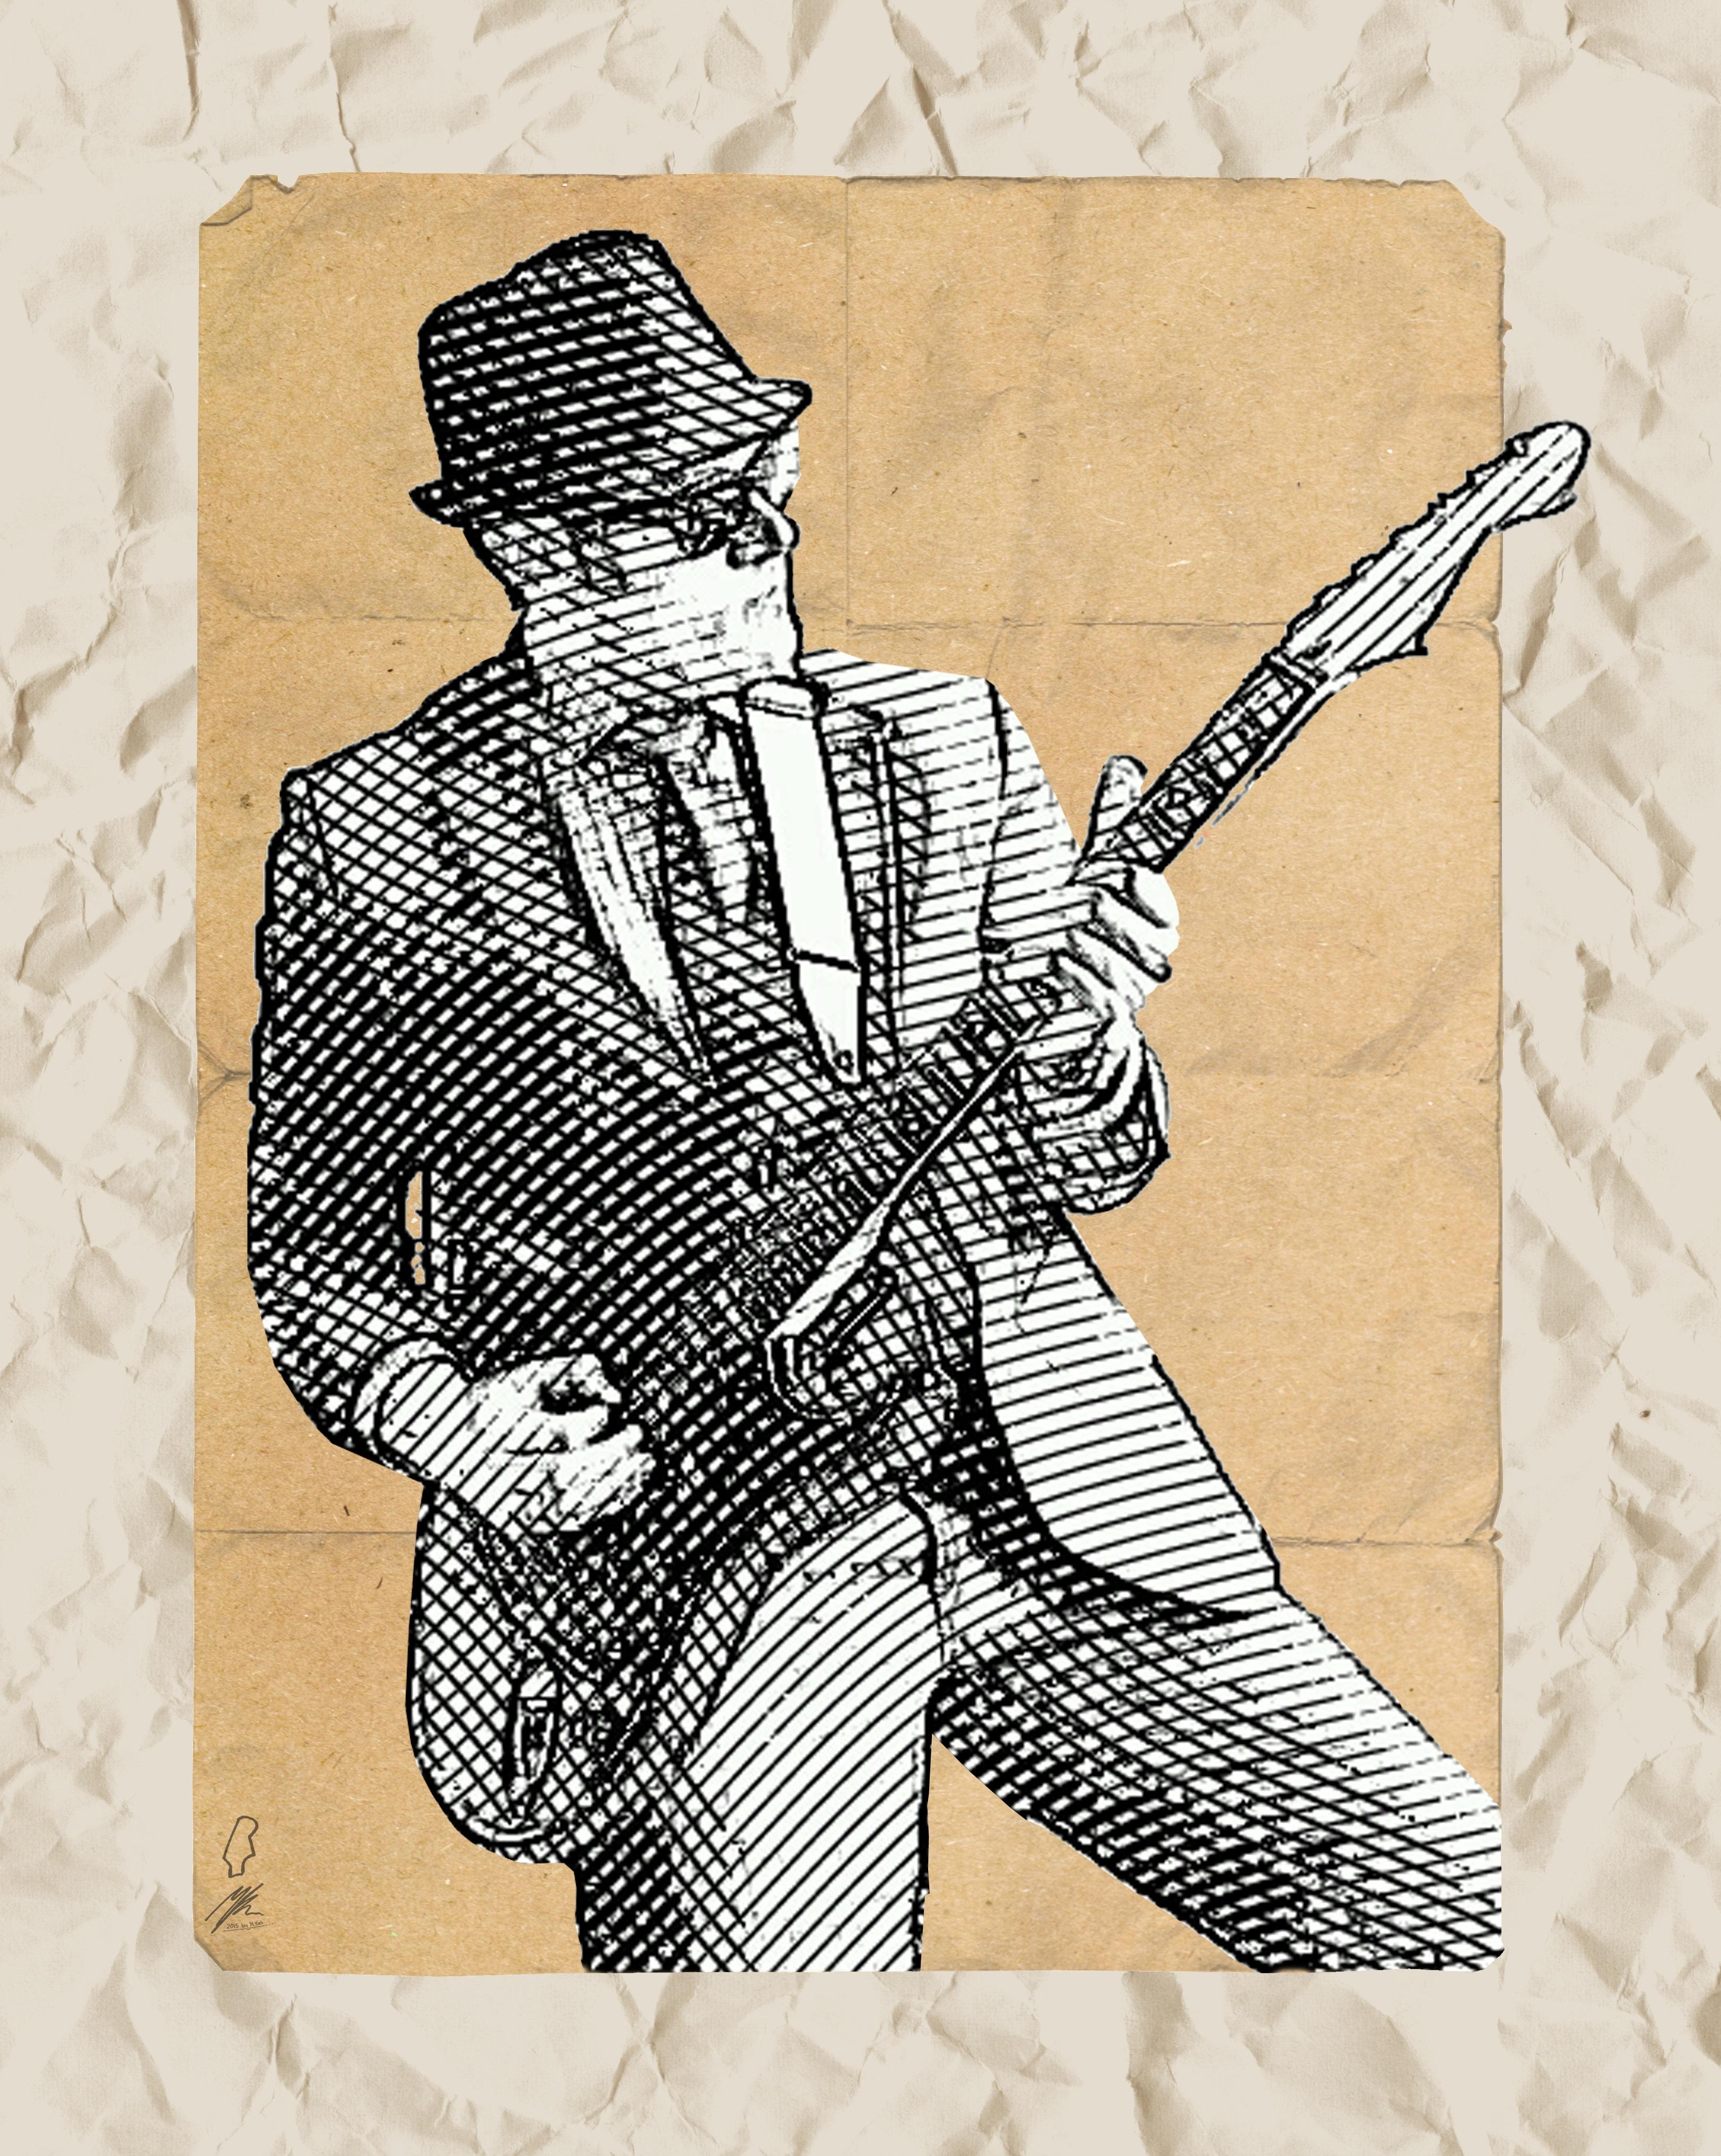 Kostenlose foto : Rock, Silhouette, Musik-, Muster, Jung, Musiker ...